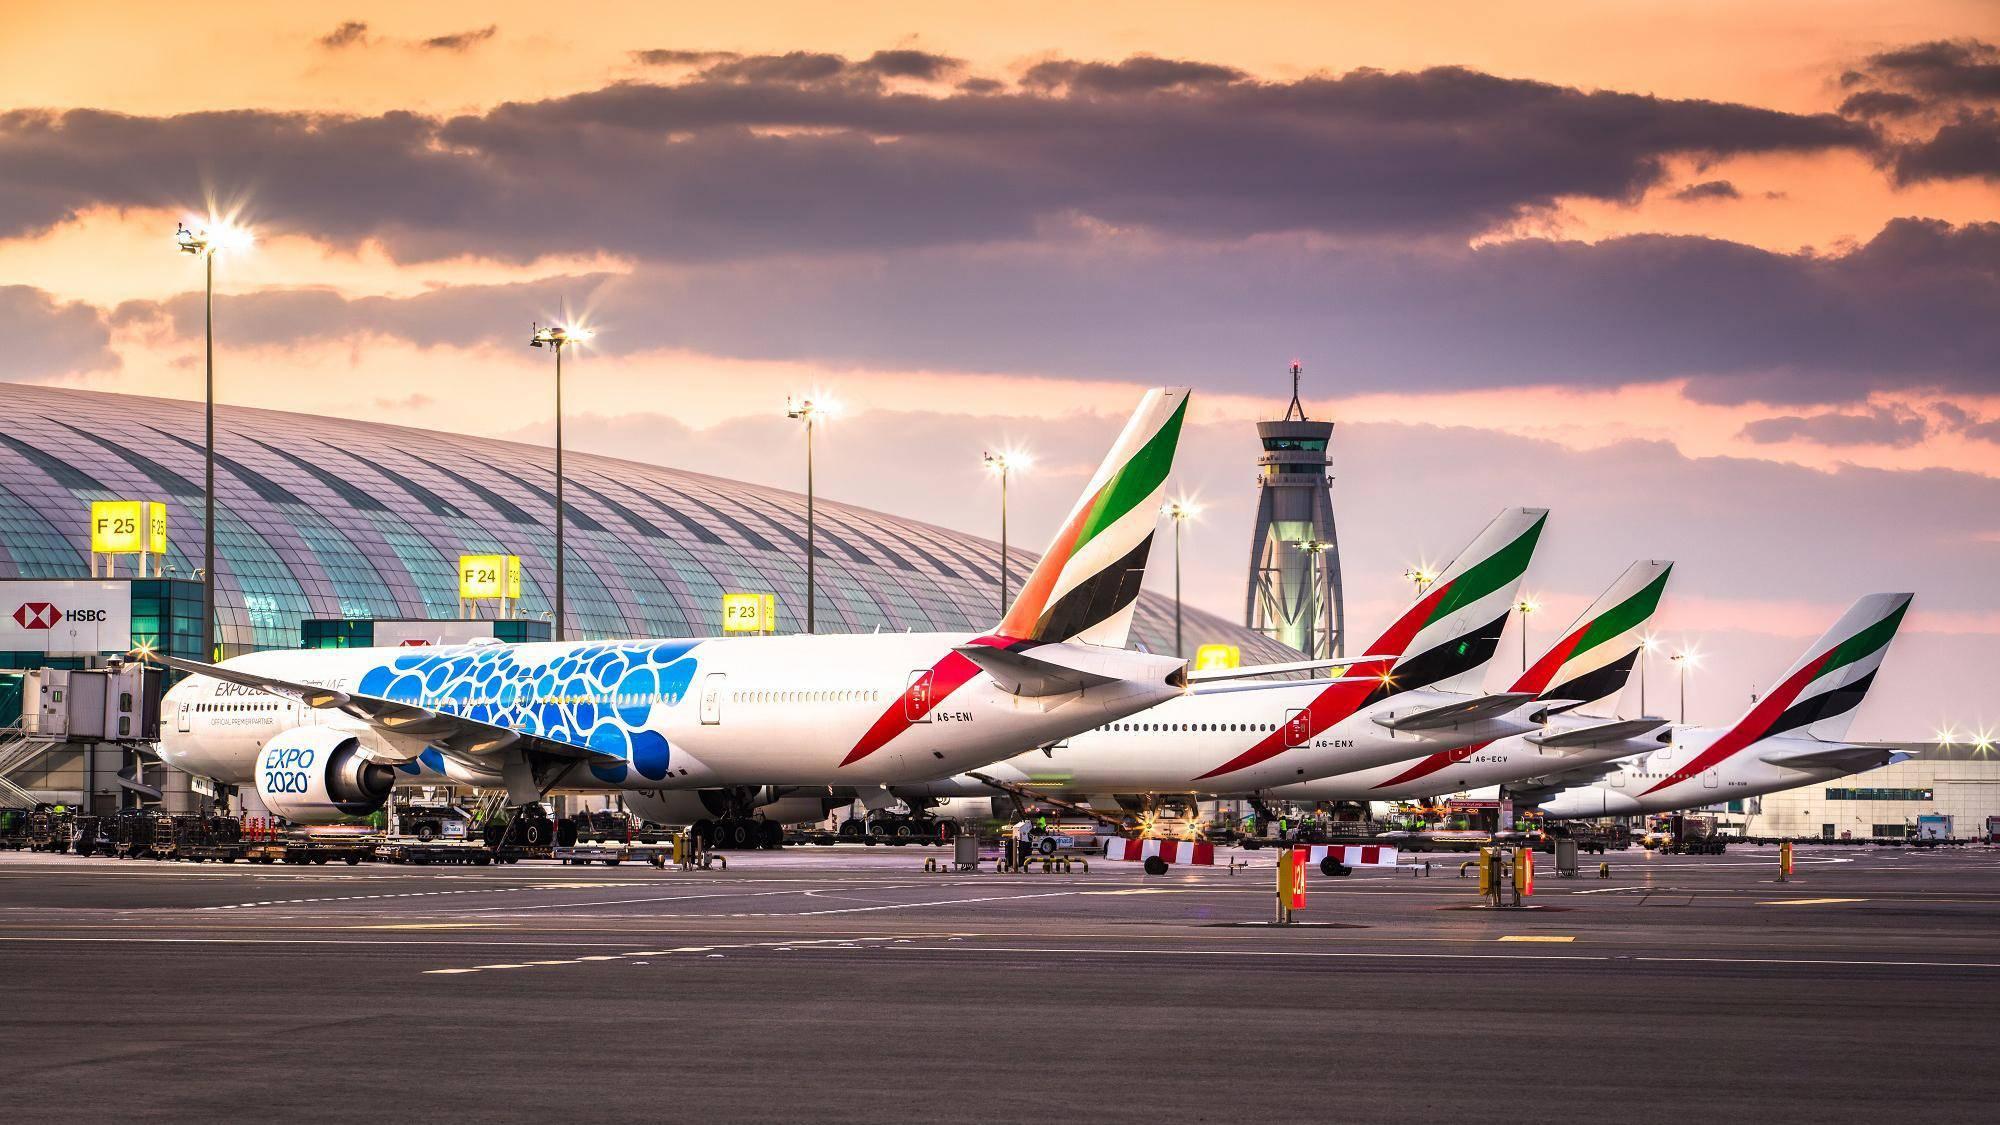 India, Pakistan flights suspended until at least Aug 7, says Emirates